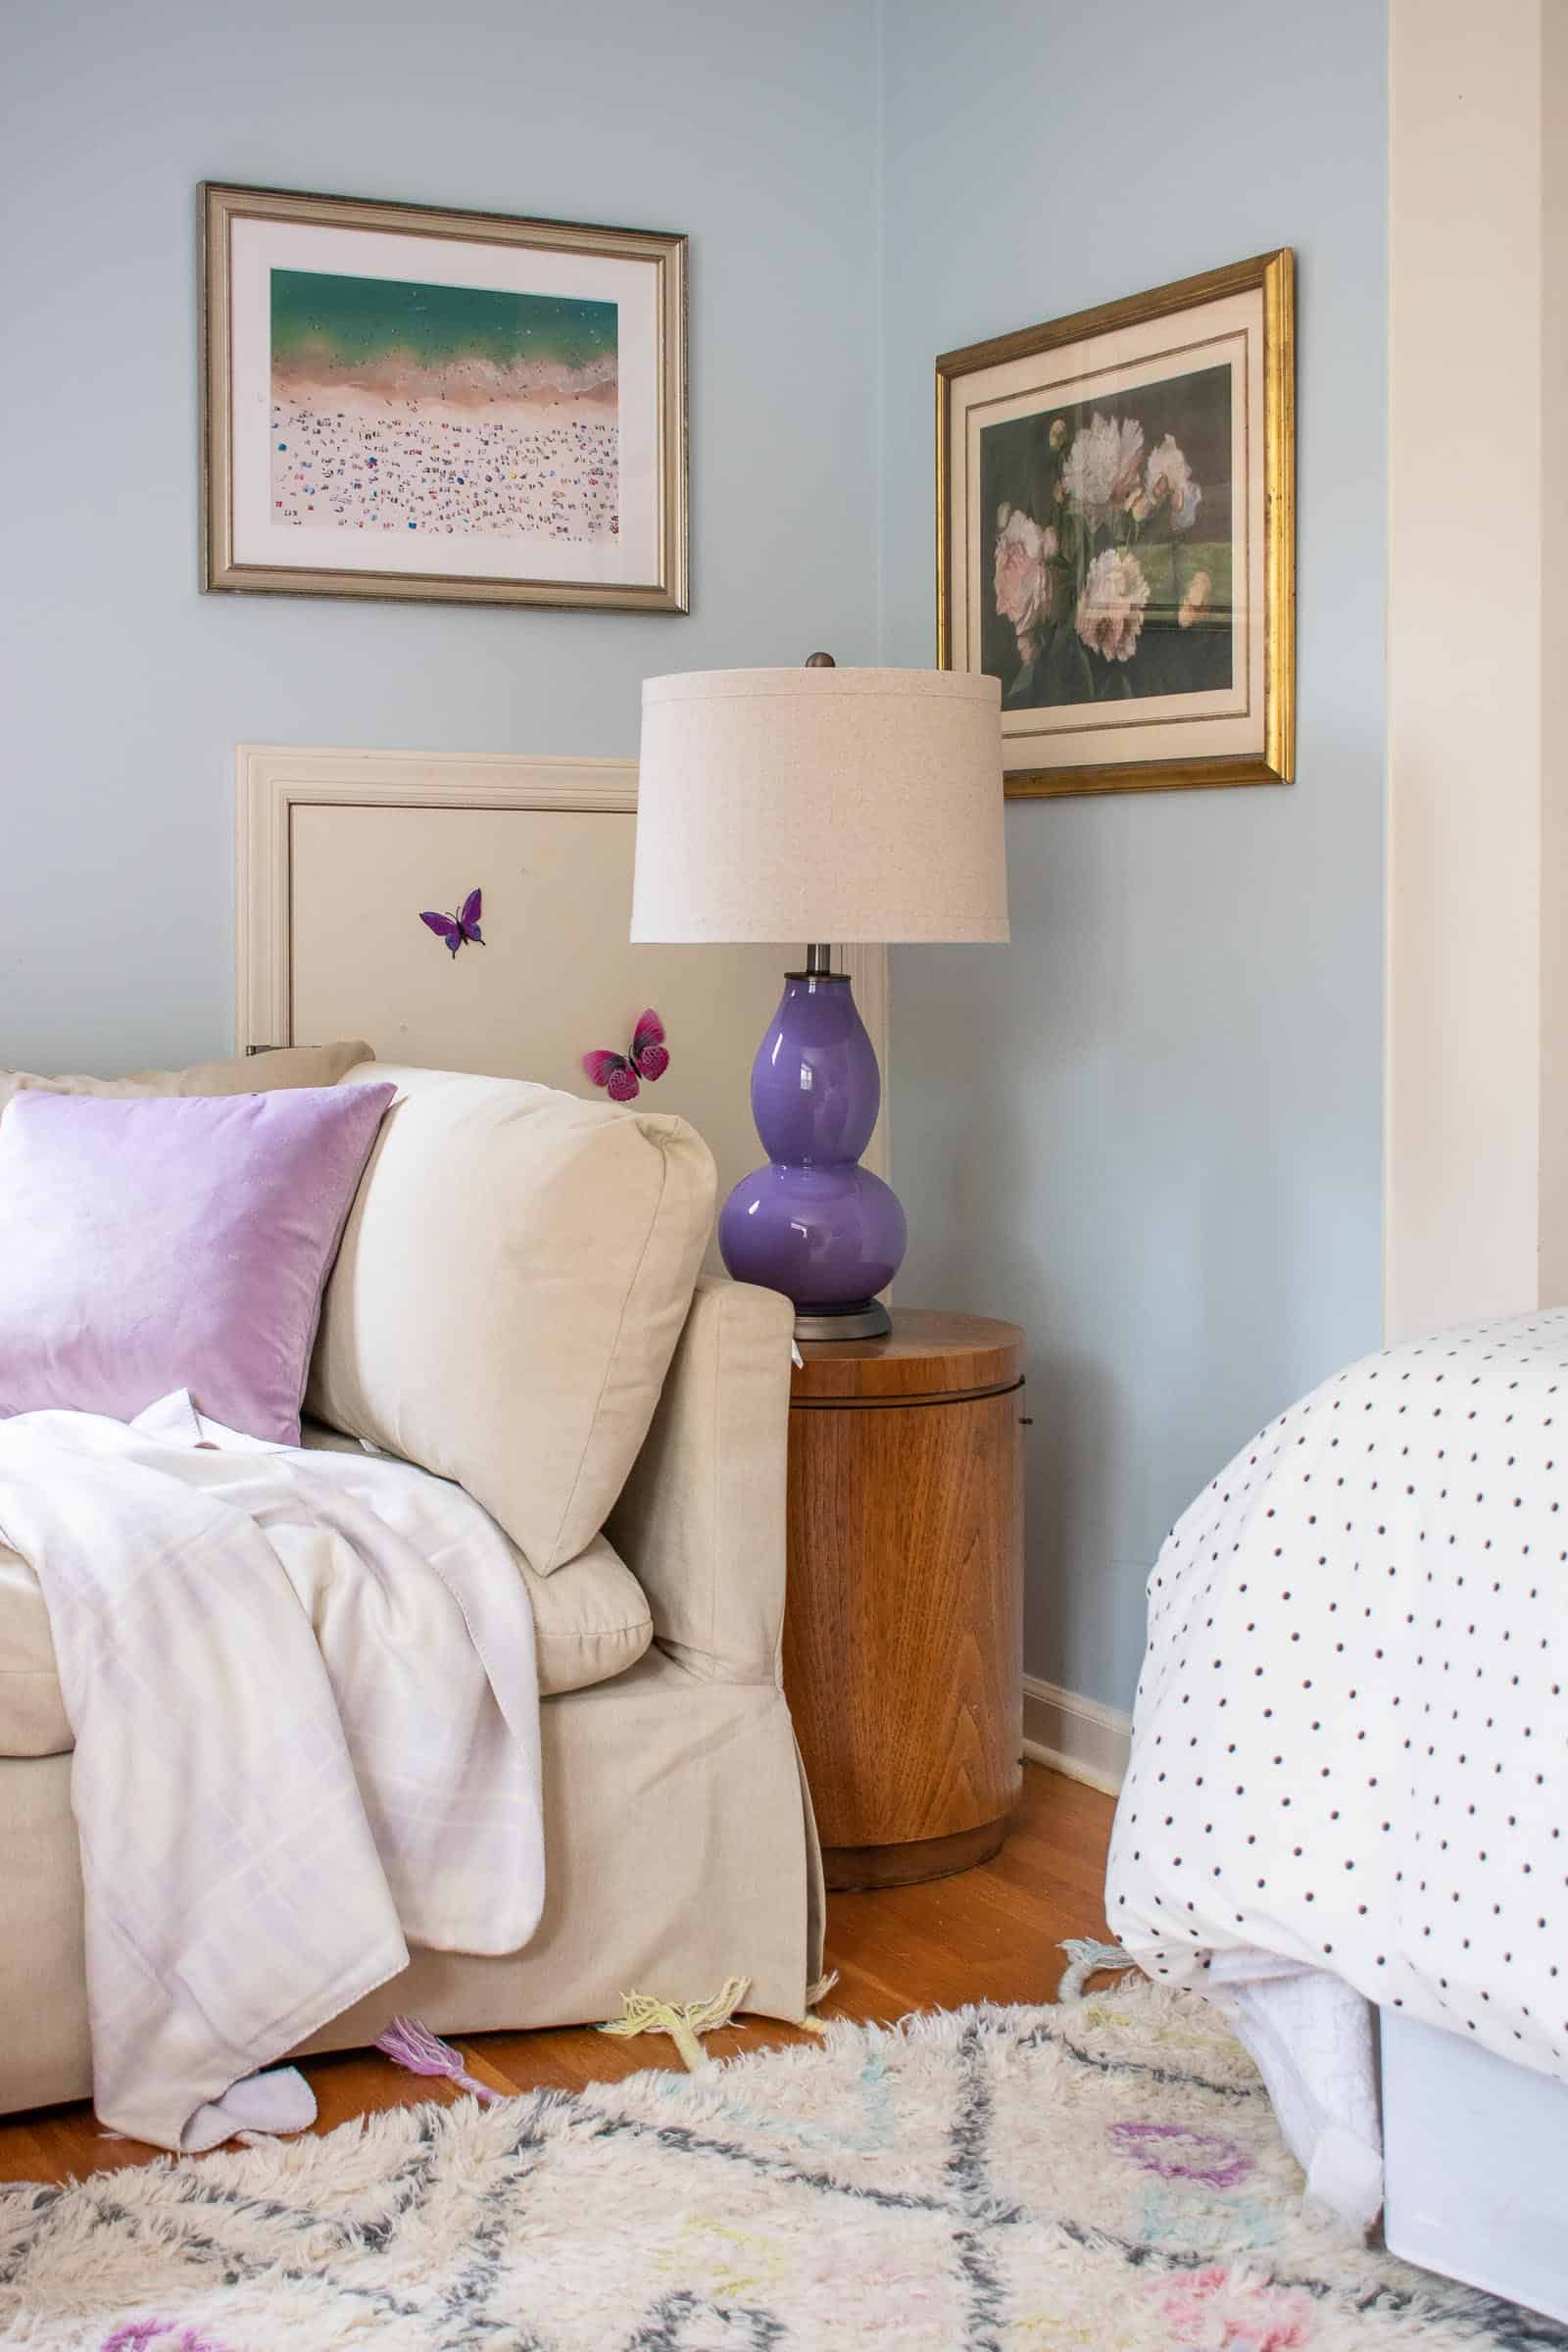 purple lamp in the corner